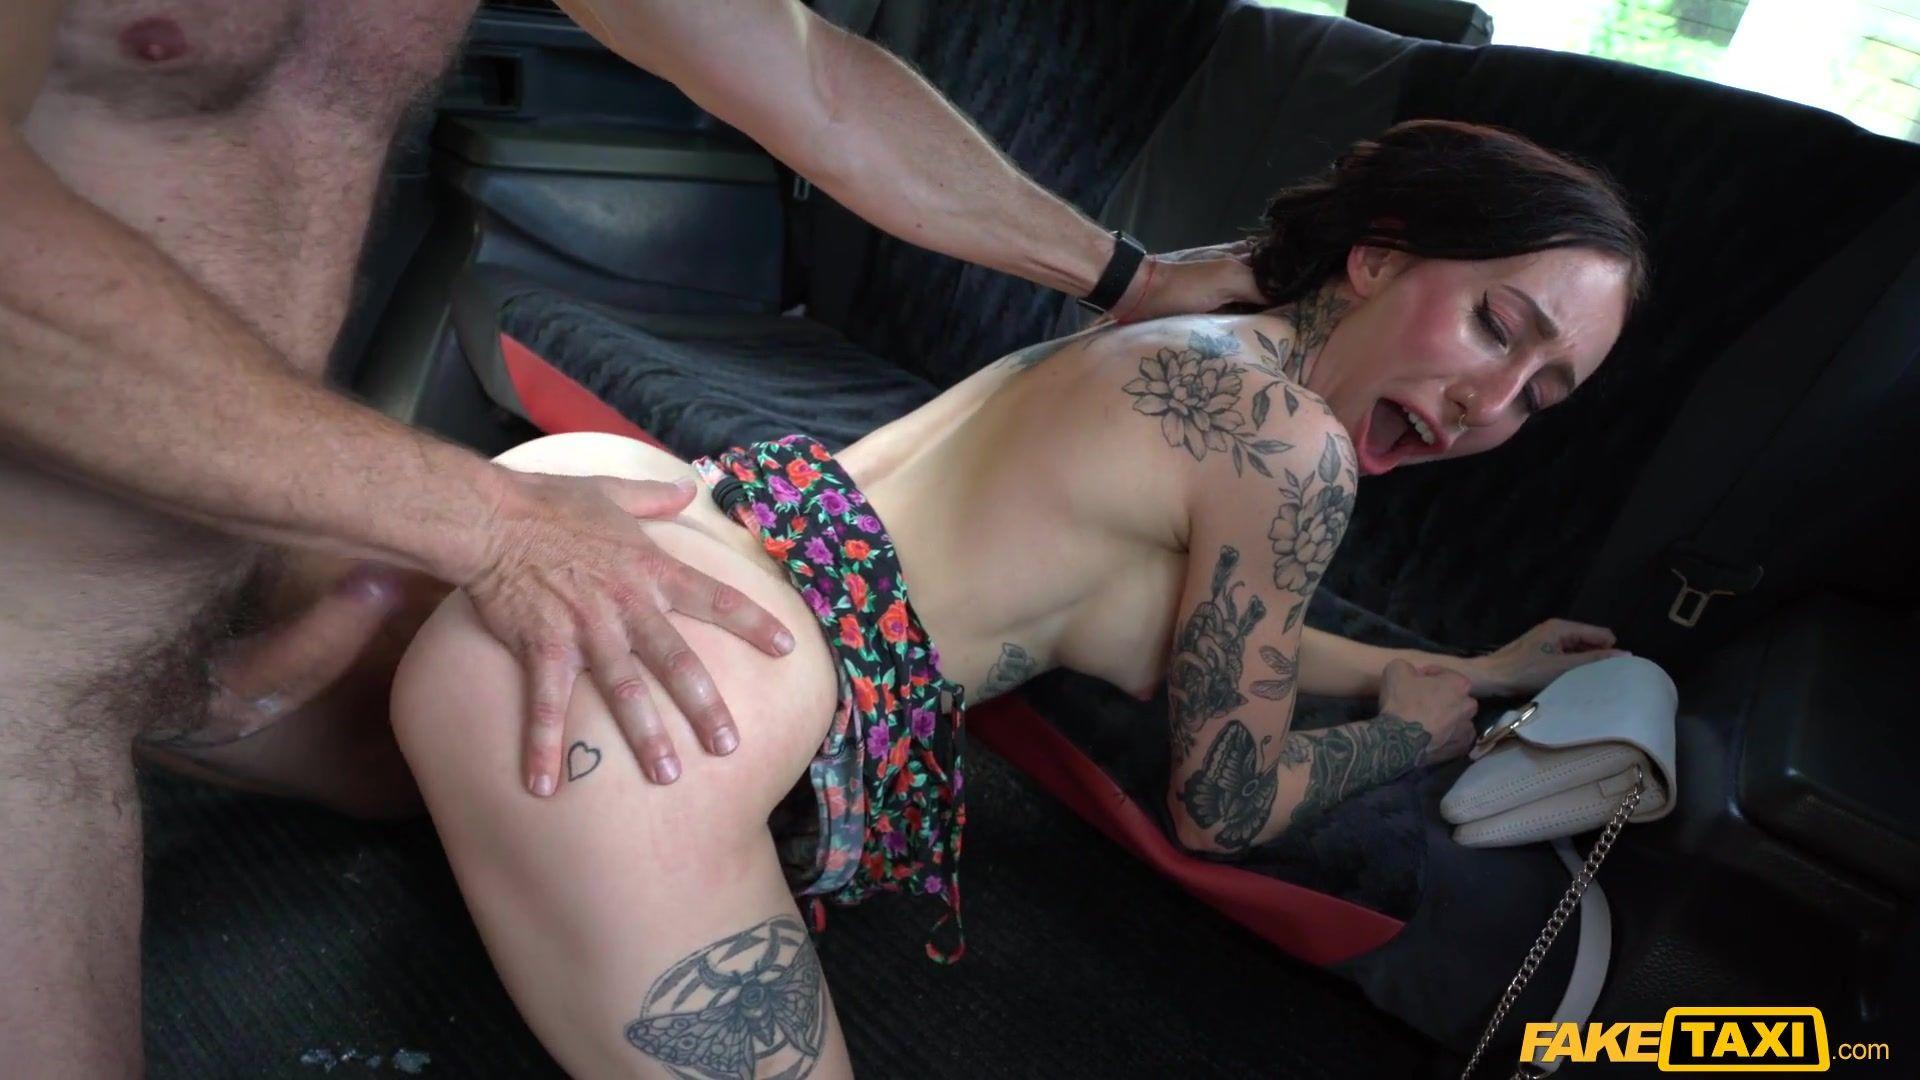 Fake Taxi - The Tattooed Turn On Temptress 2 - Esluna